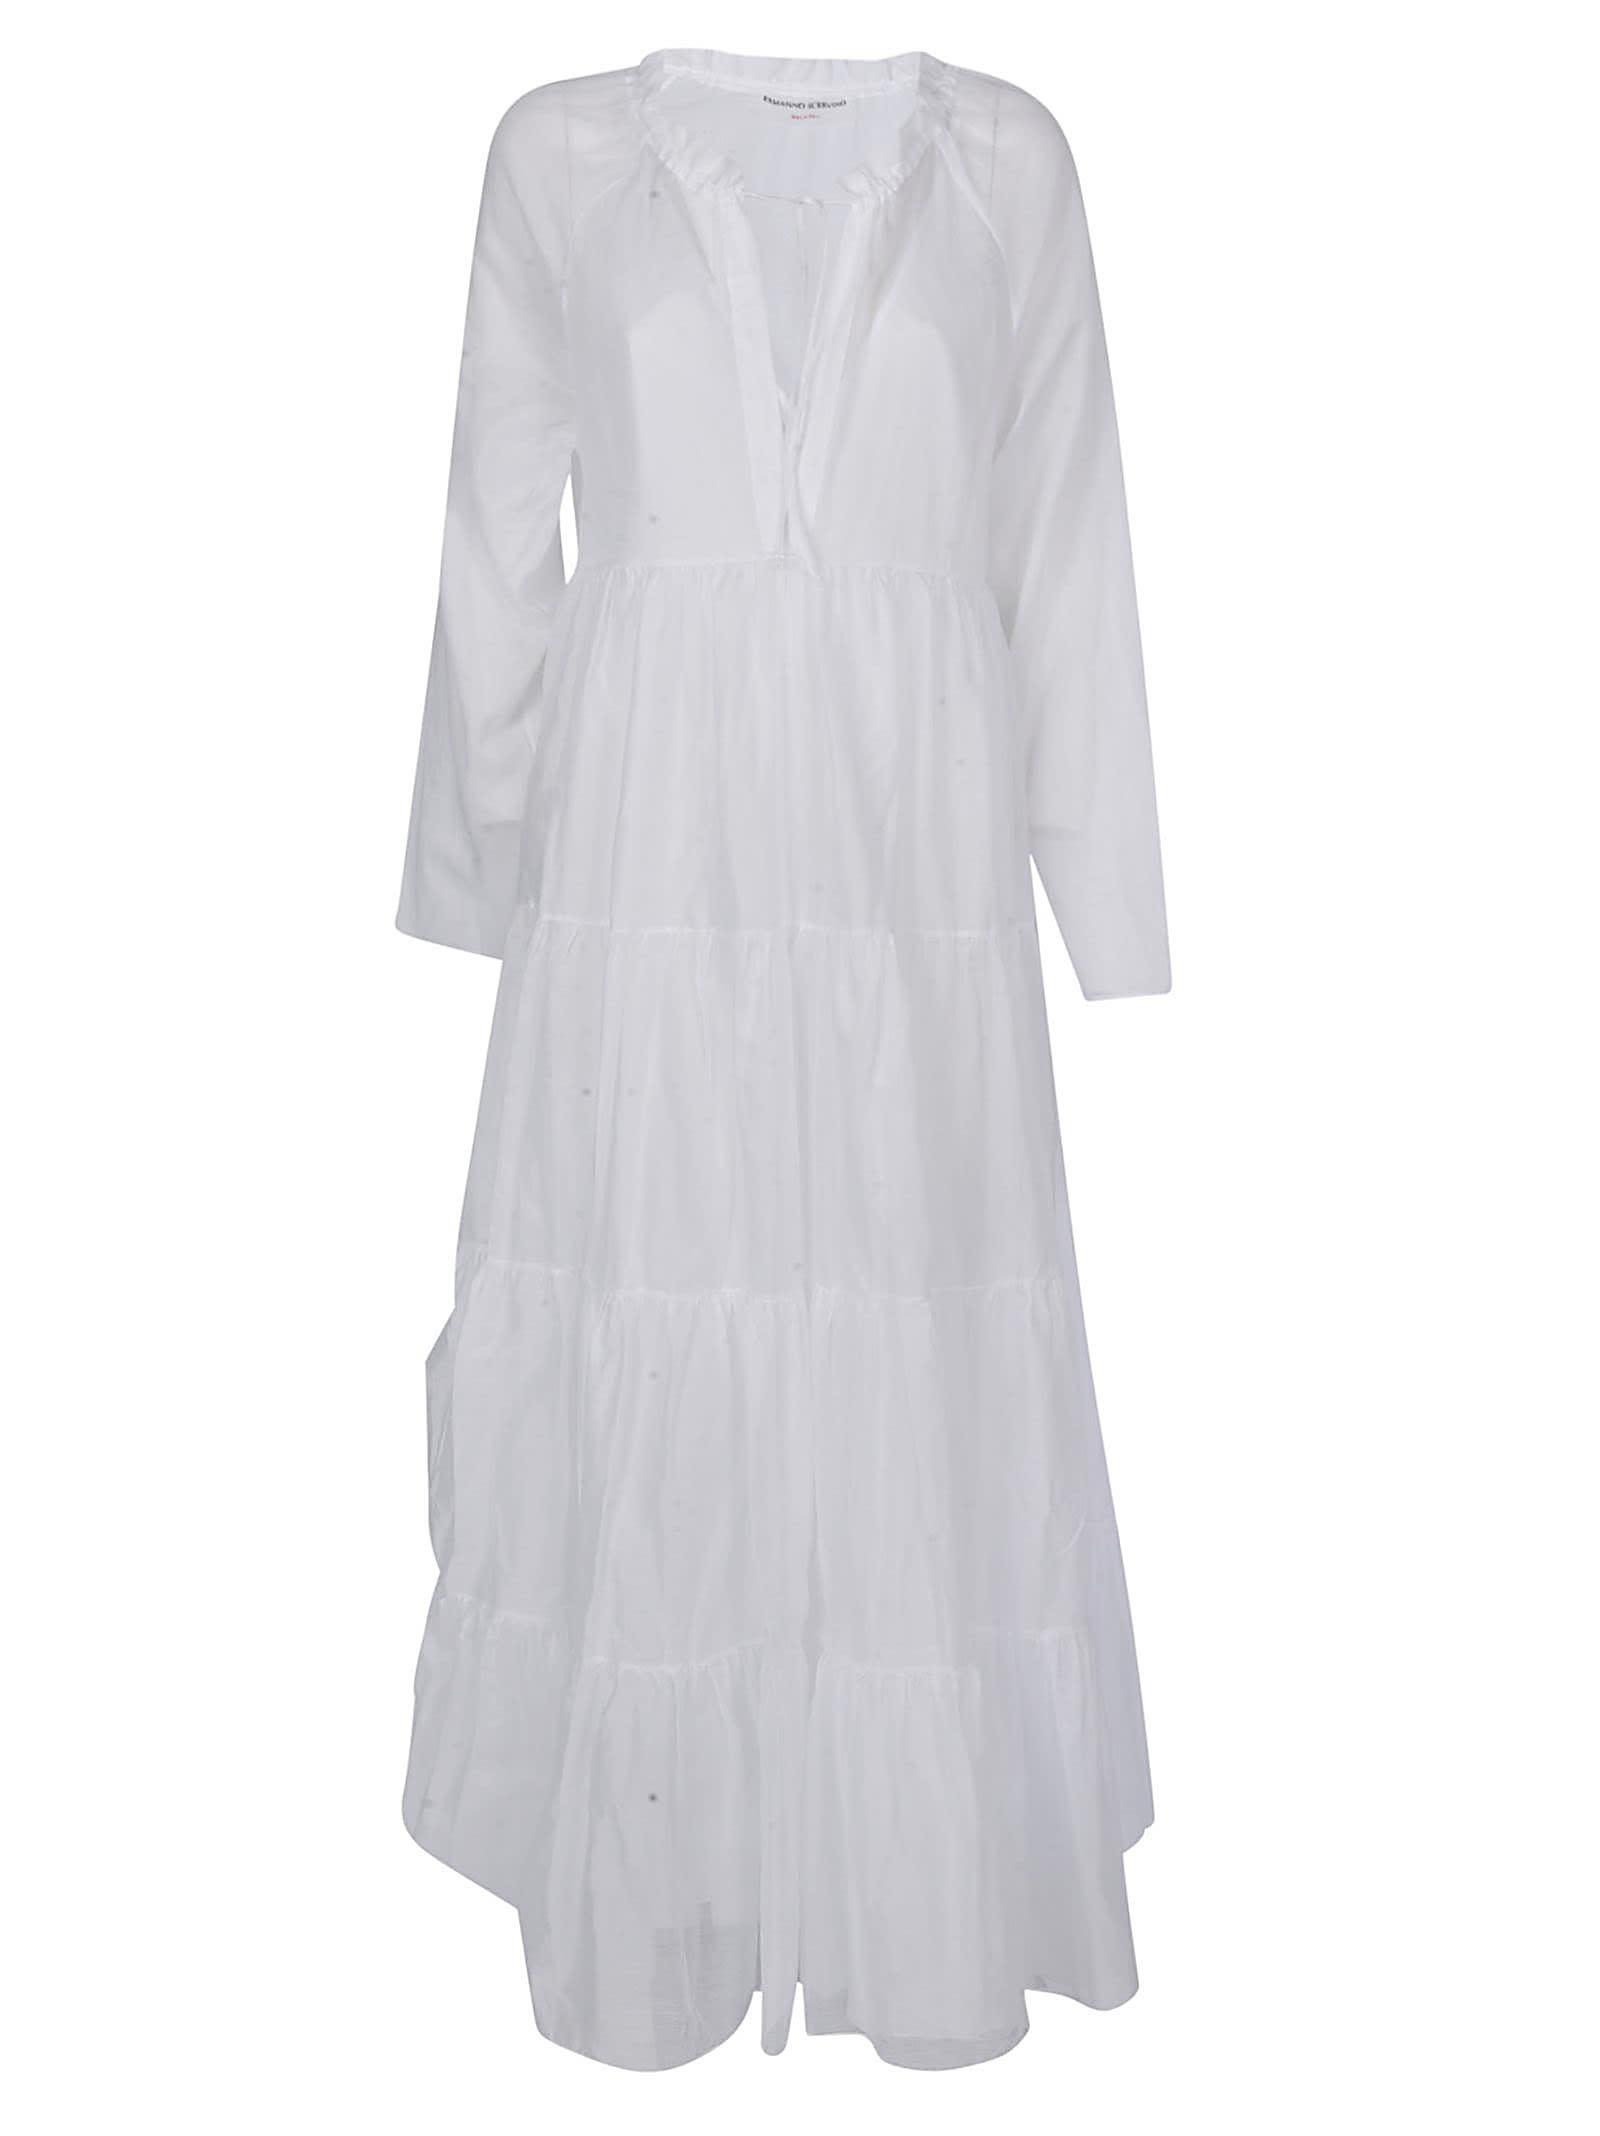 Buy Ermanno Scervino Layered V-neck Dress online, shop Ermanno Scervino with free shipping